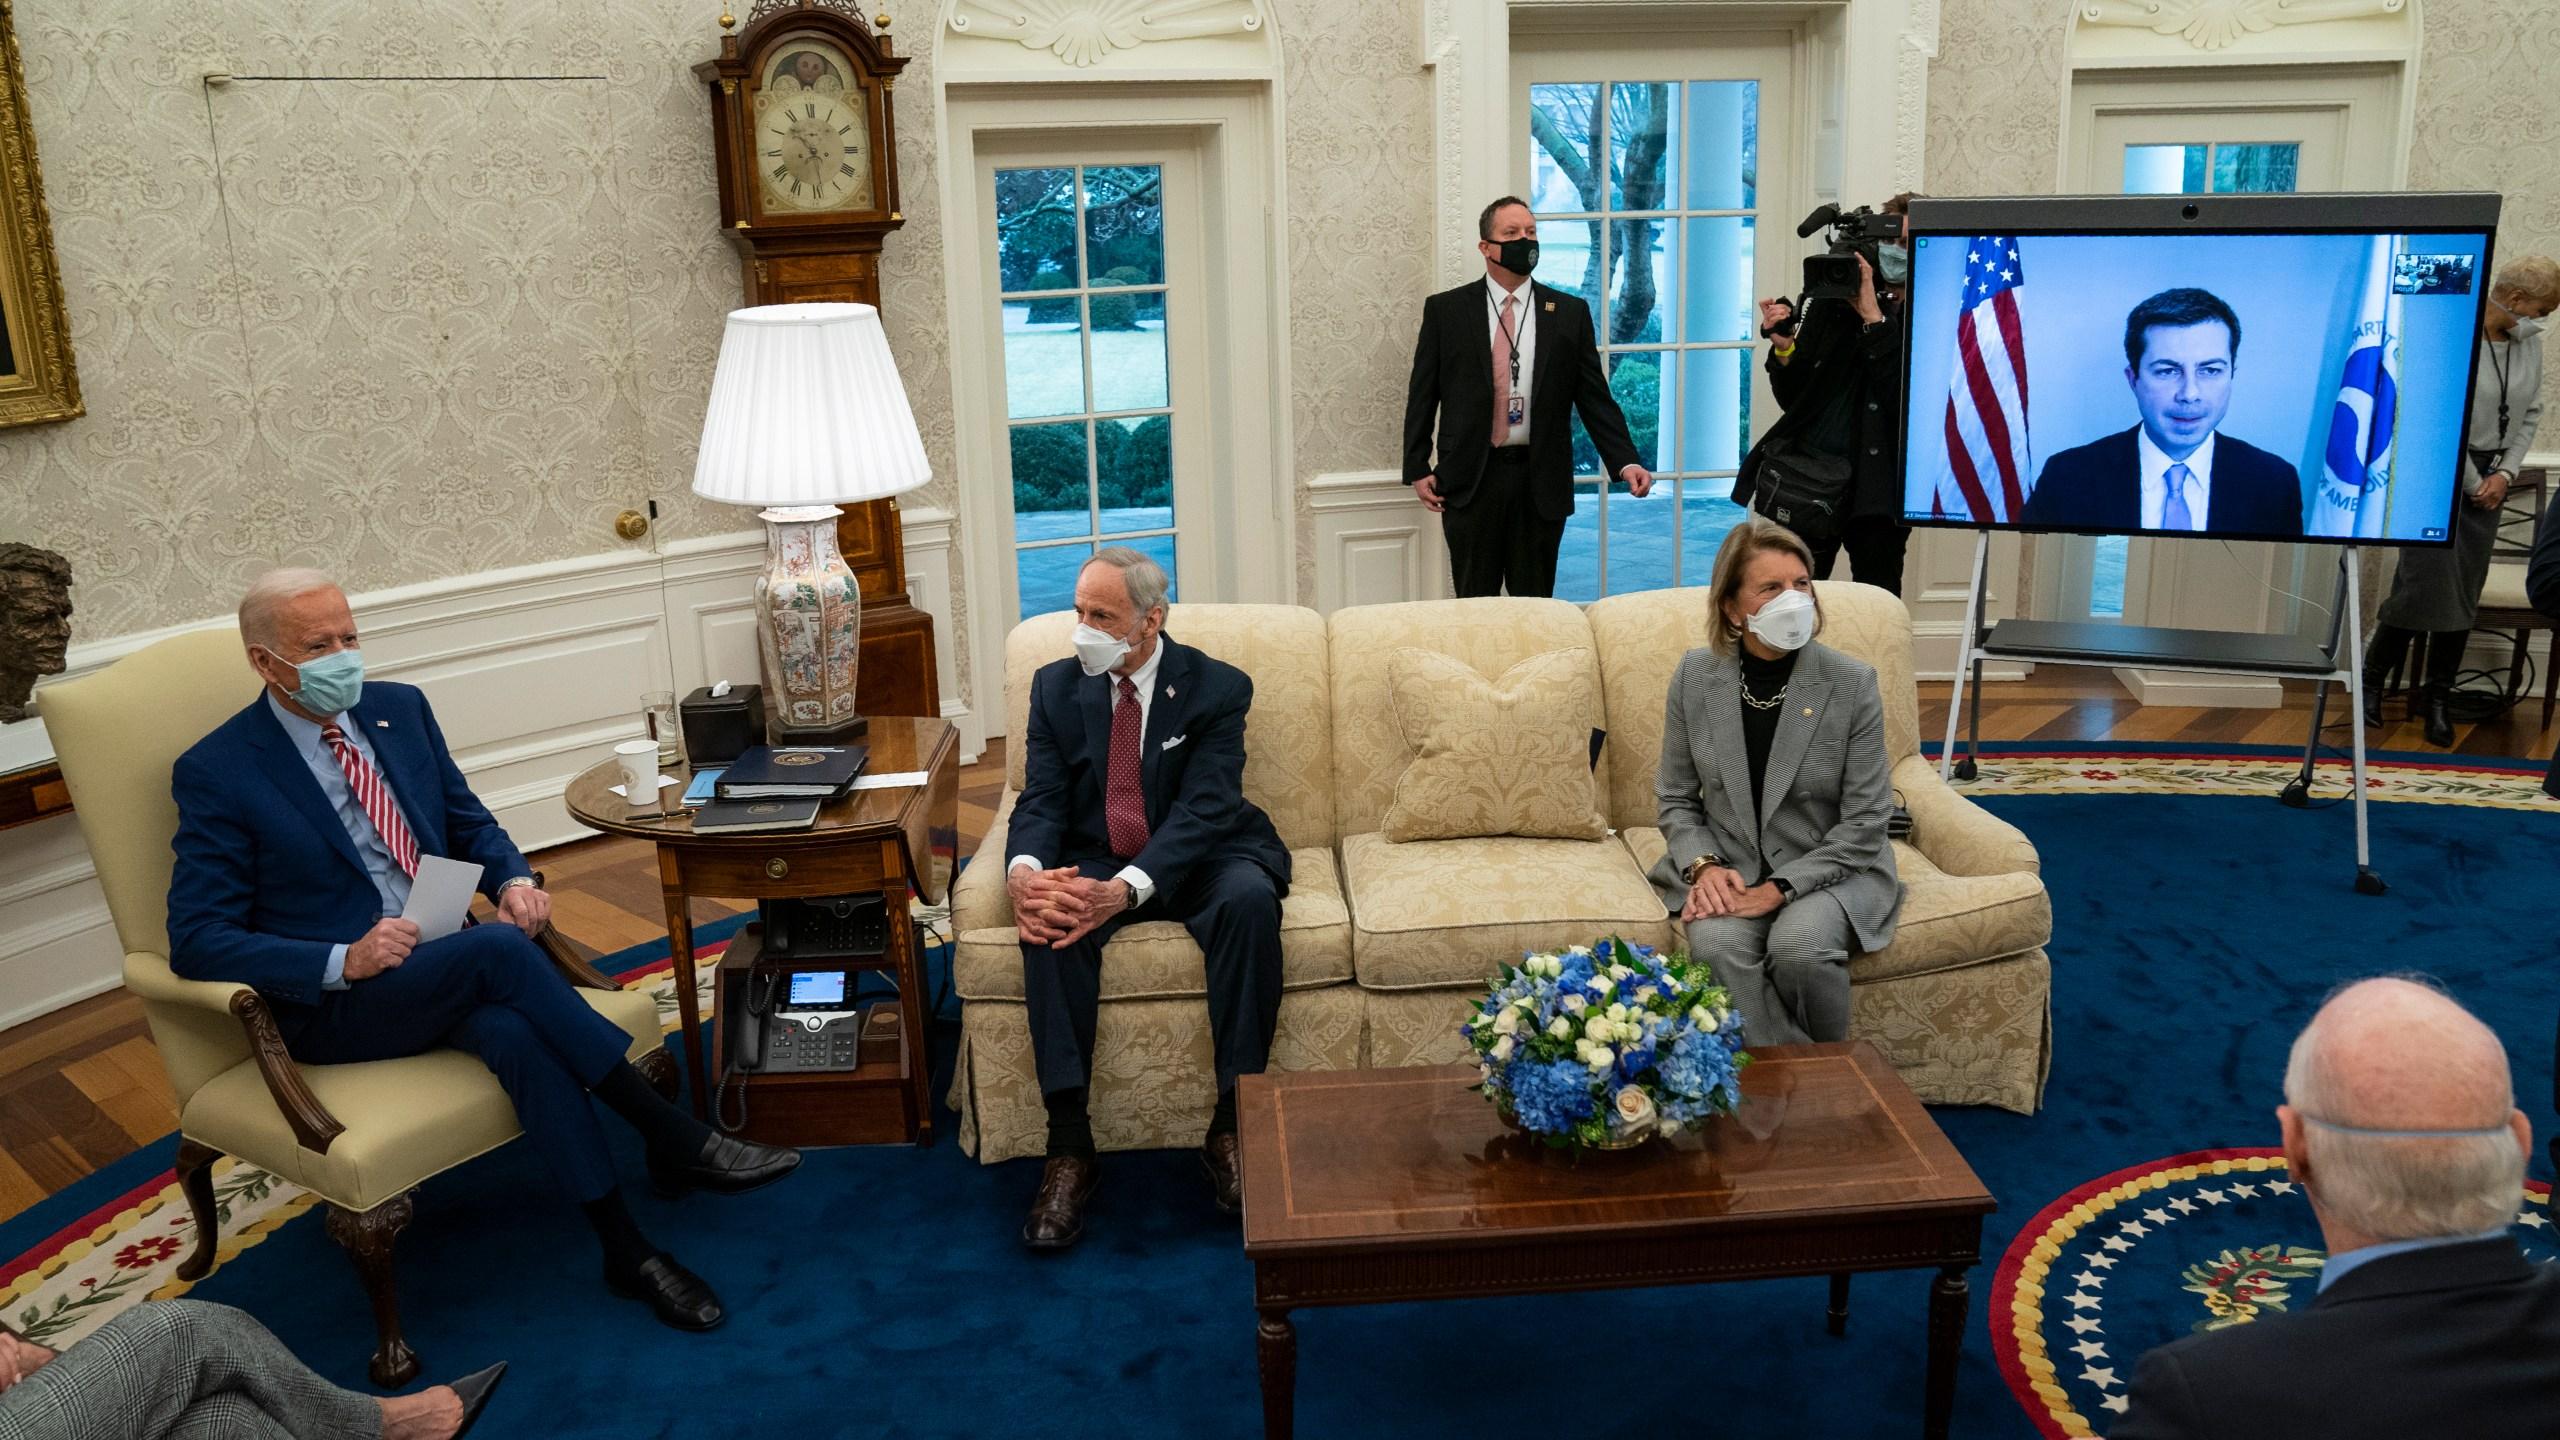 Joe Biden, Tom Carper, Shelley Moore Capito, Pete Buttigieg